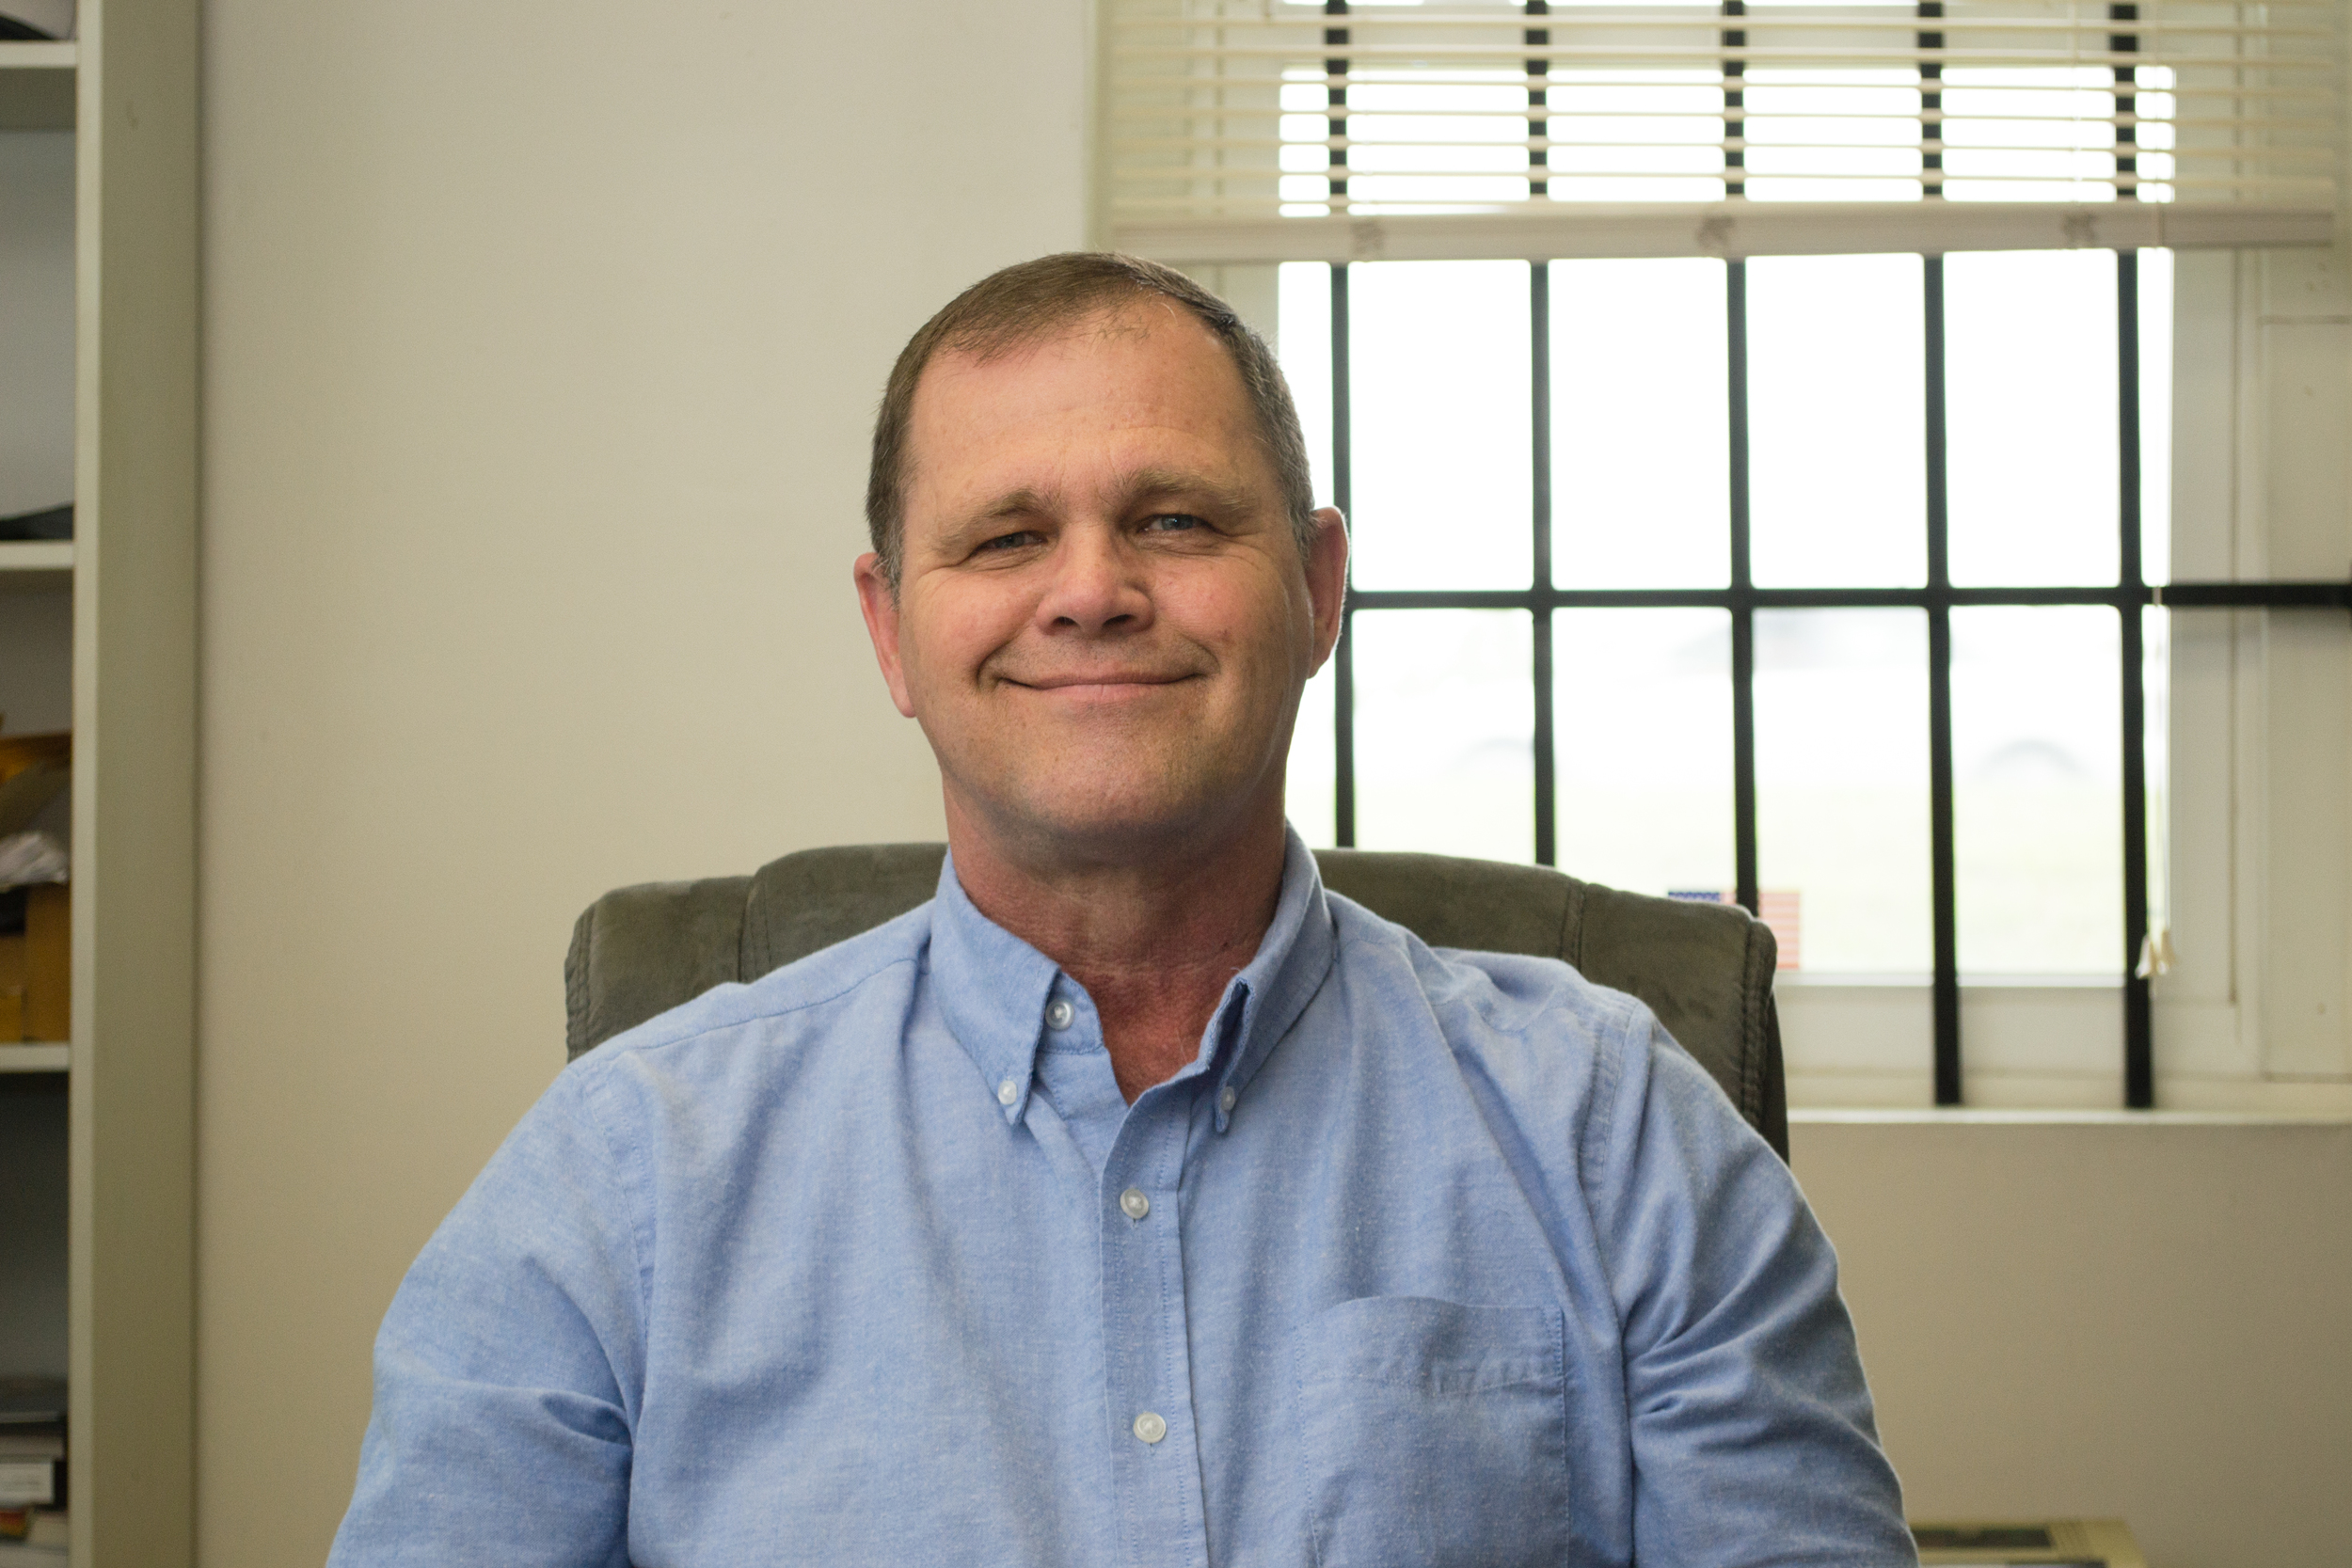 Rob Hotle, President 770-455-6551  rob@herculessealcoat.com